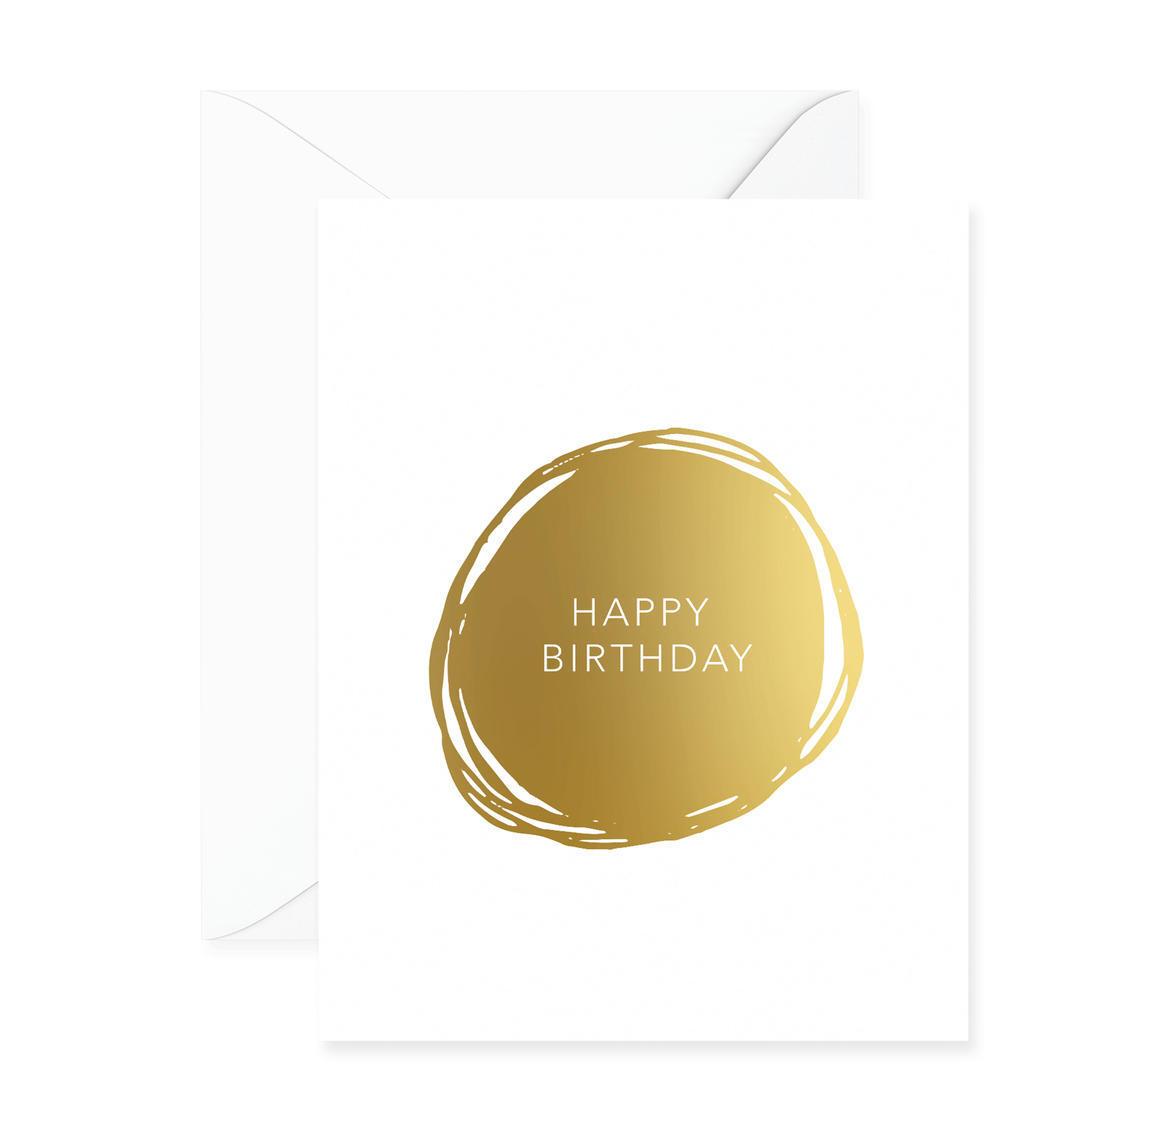 Happy Birthday Circle Greeting Card | Trada Marketplace